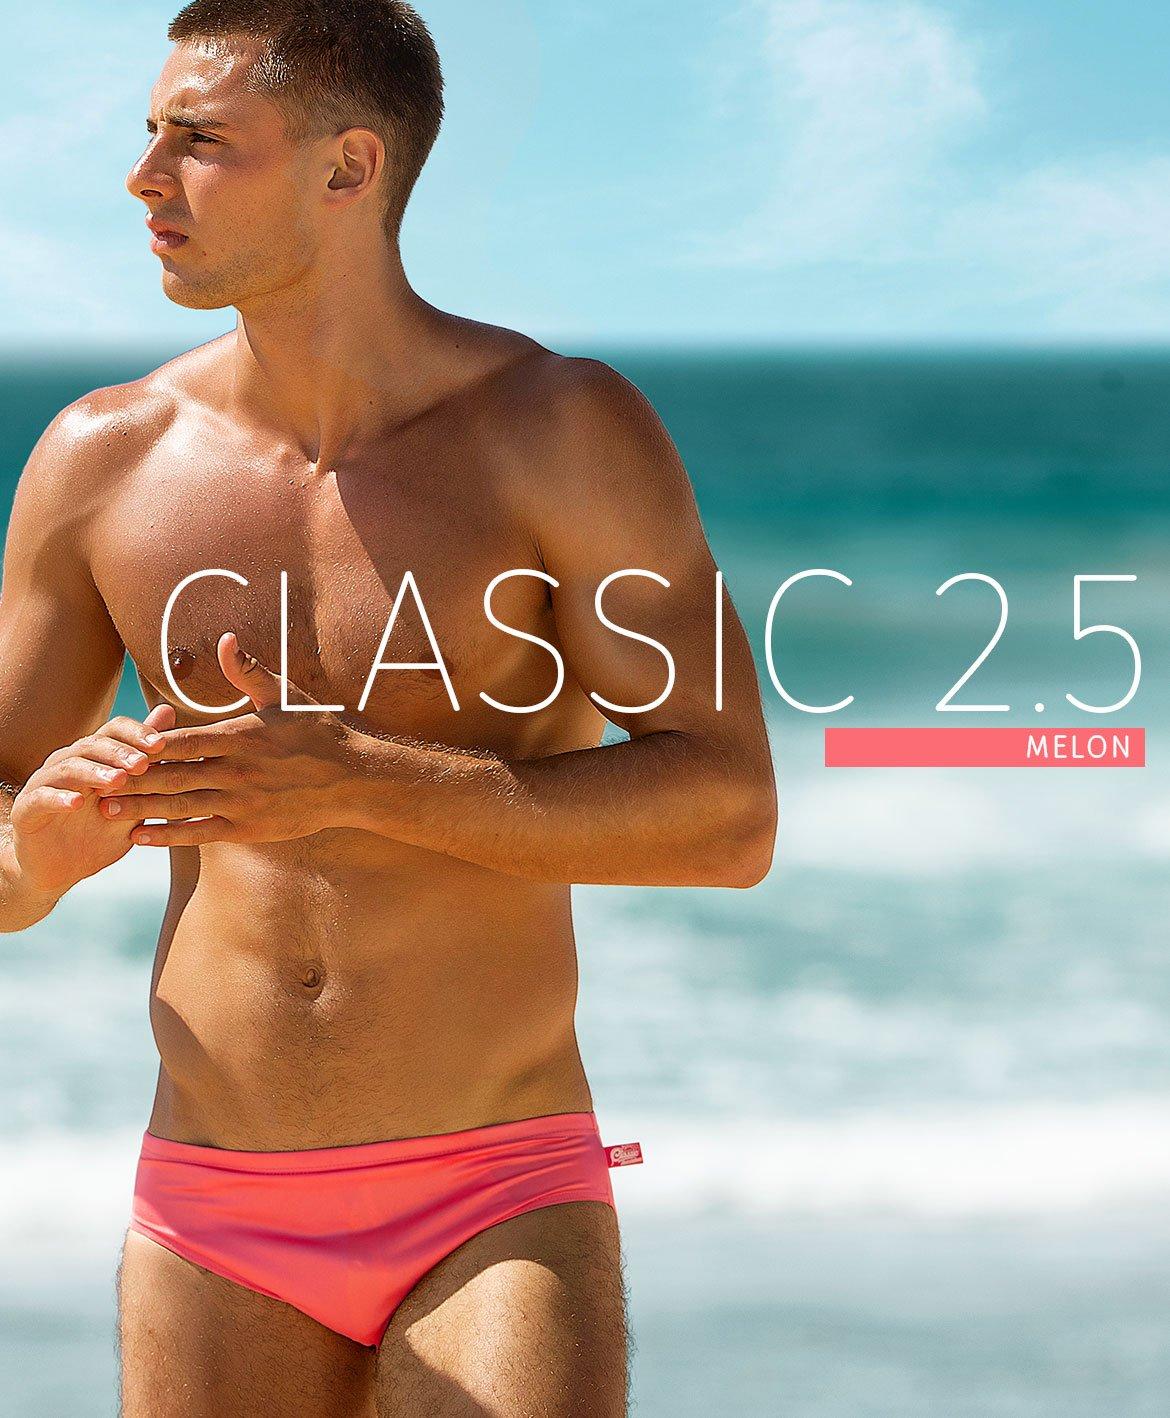 Classic 2.5 Melon Homepage Image